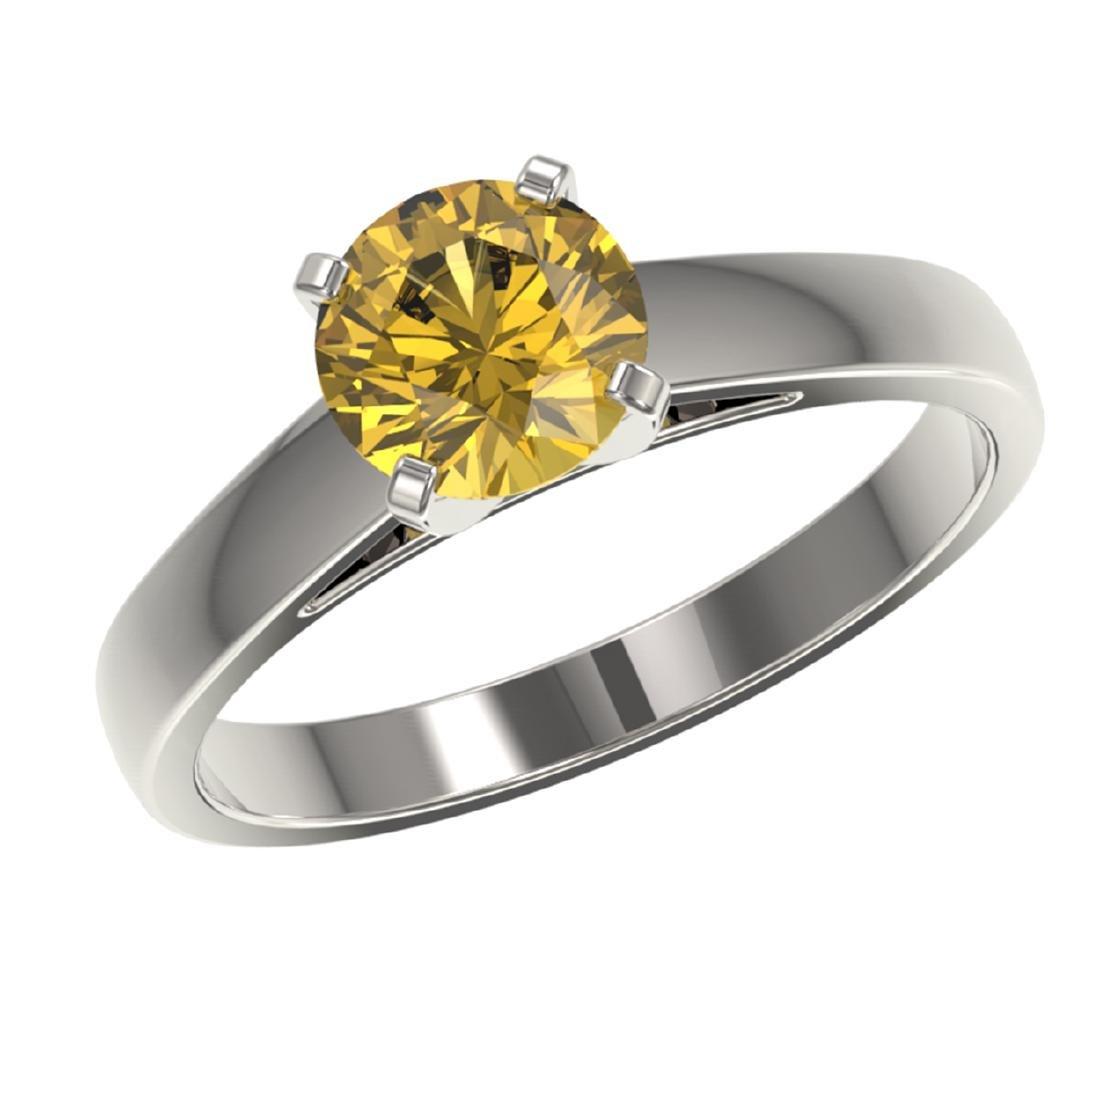 1.29 ctw Intense Yellow Diamond Solitaire Ring 10K - 2